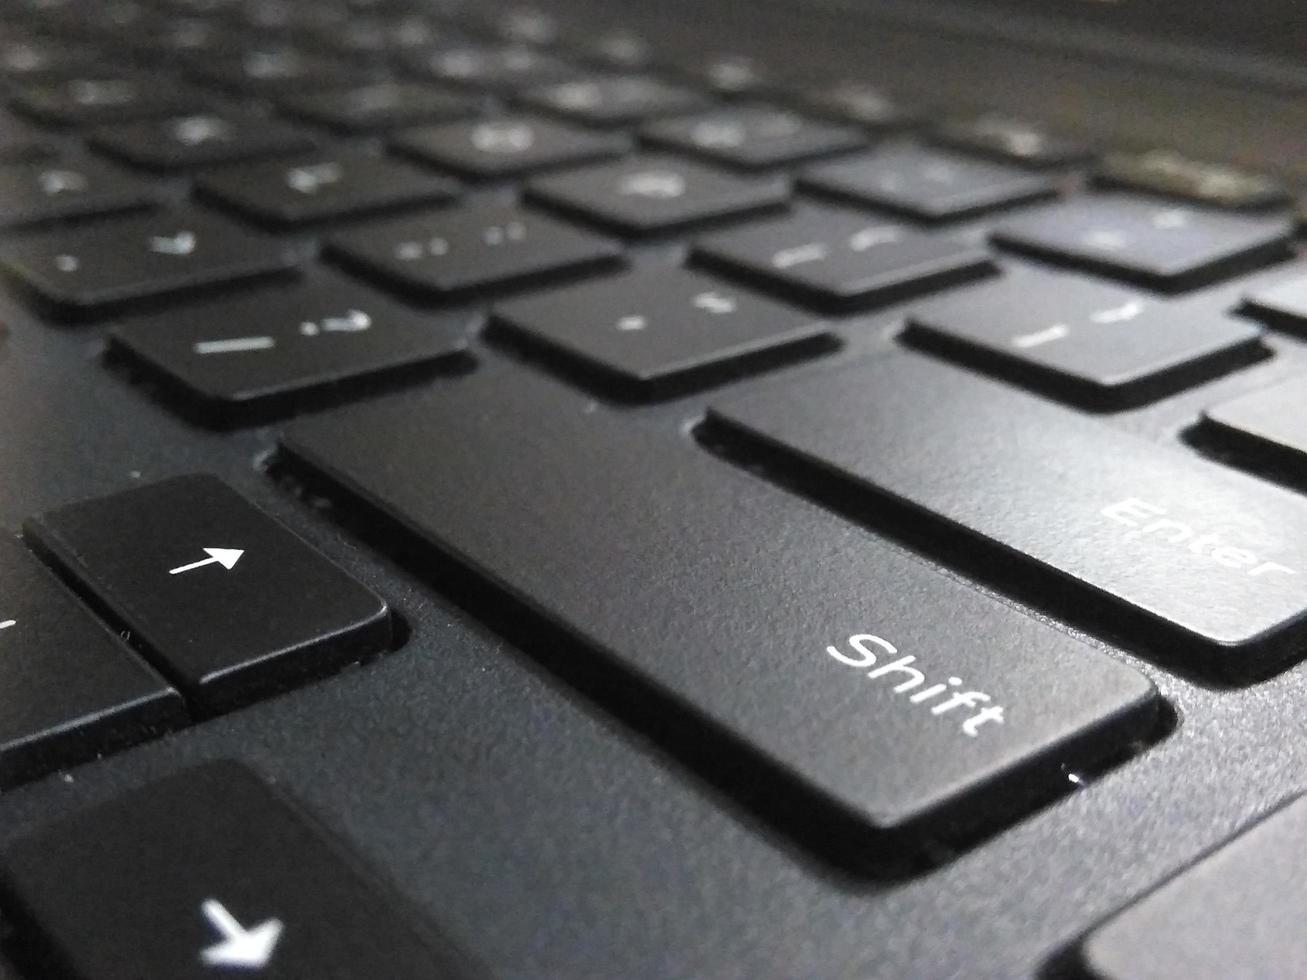 Detail of computer keyboard photo